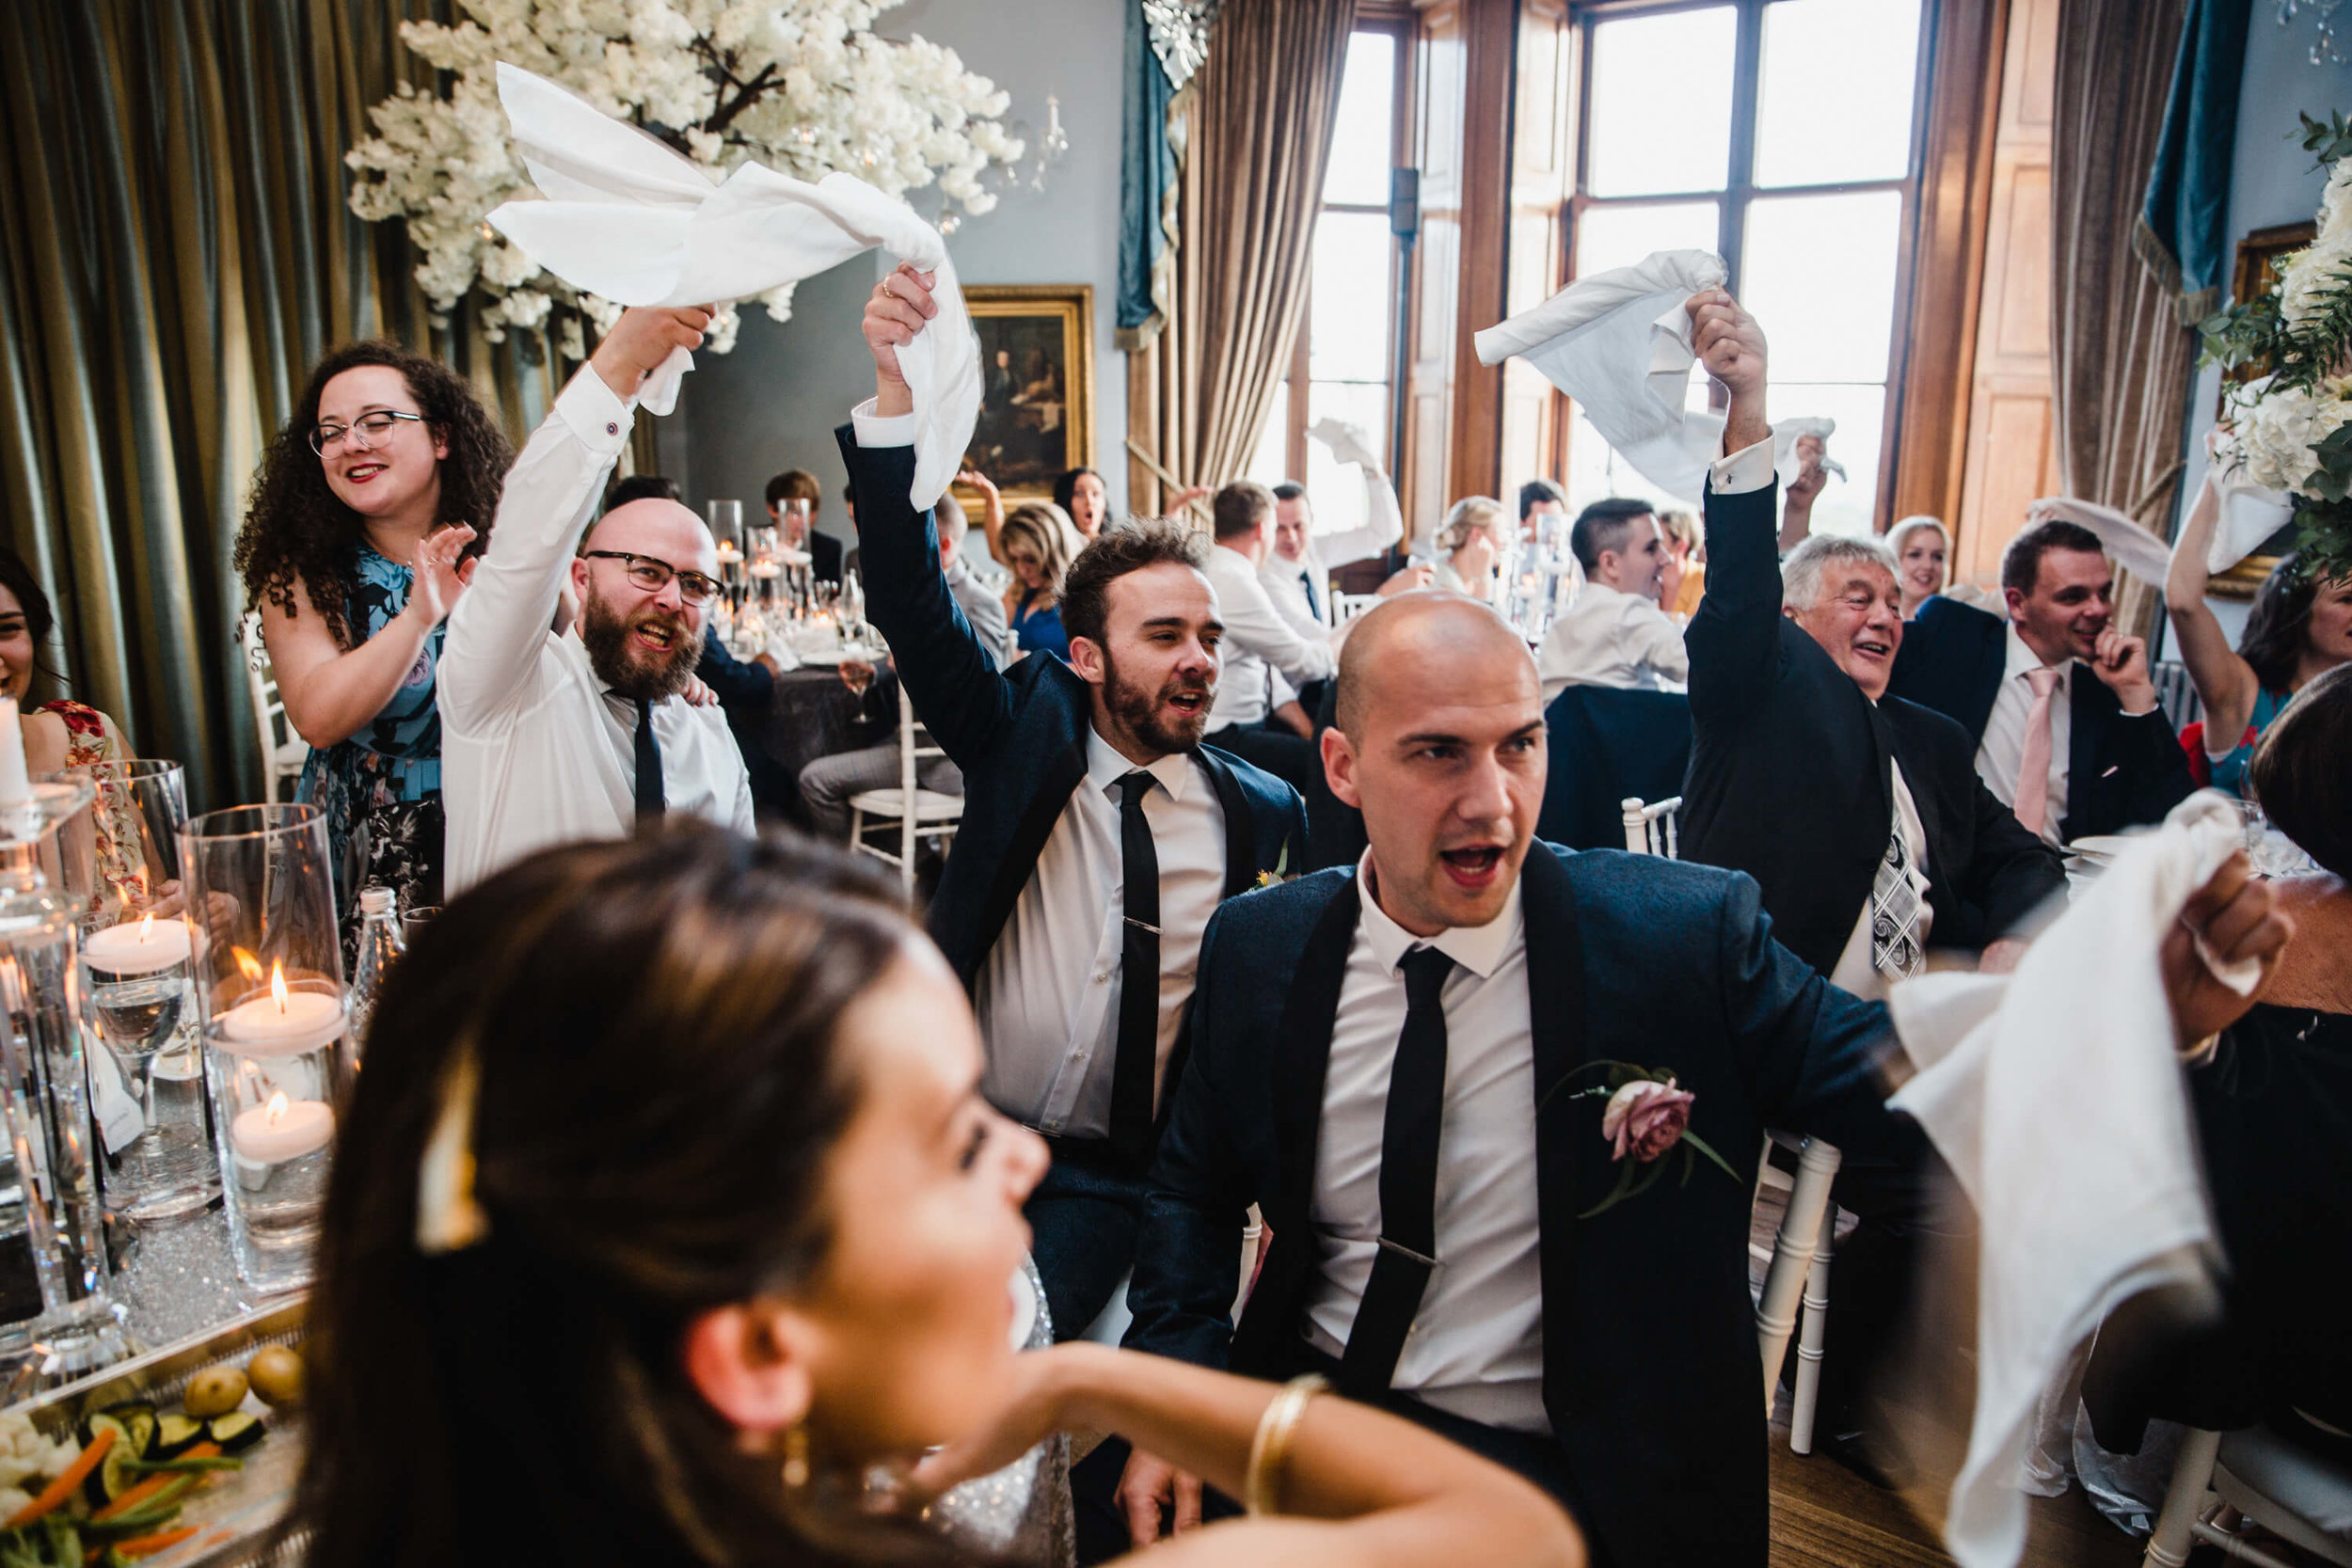 groomsmen waving handkerchiefs while singing